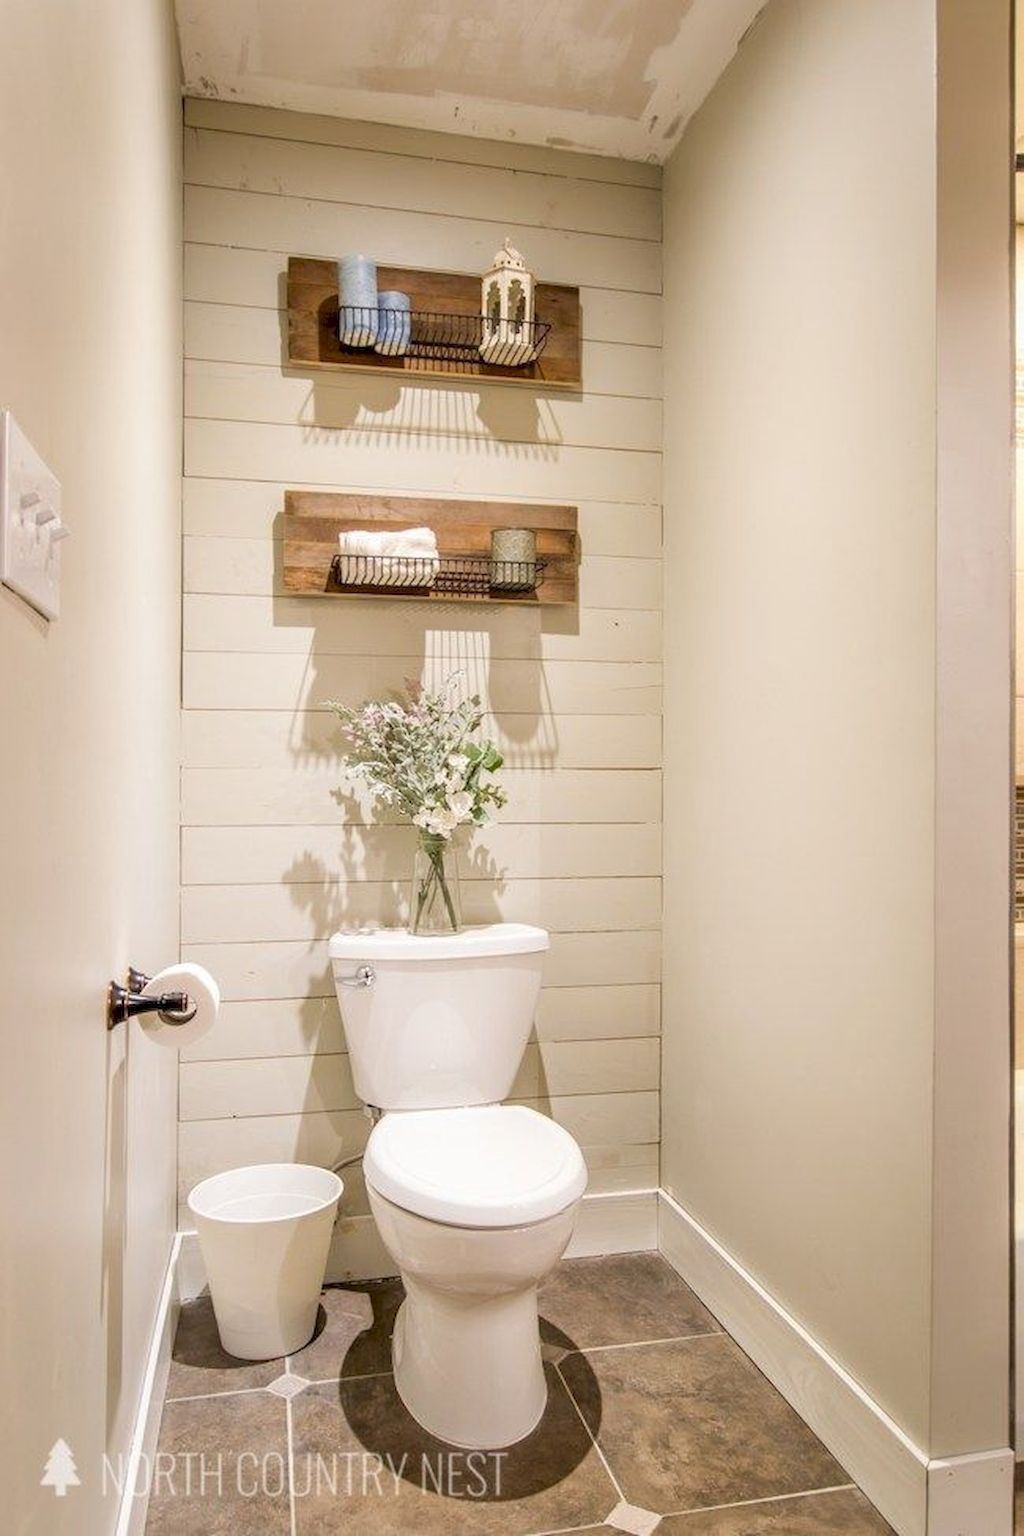 35 Diy Bathroom Shelf Ideas From Wood Pallets Elonahome Com Diy Bathroom Decor Reclaimed Wood Shelves Wood Shelves